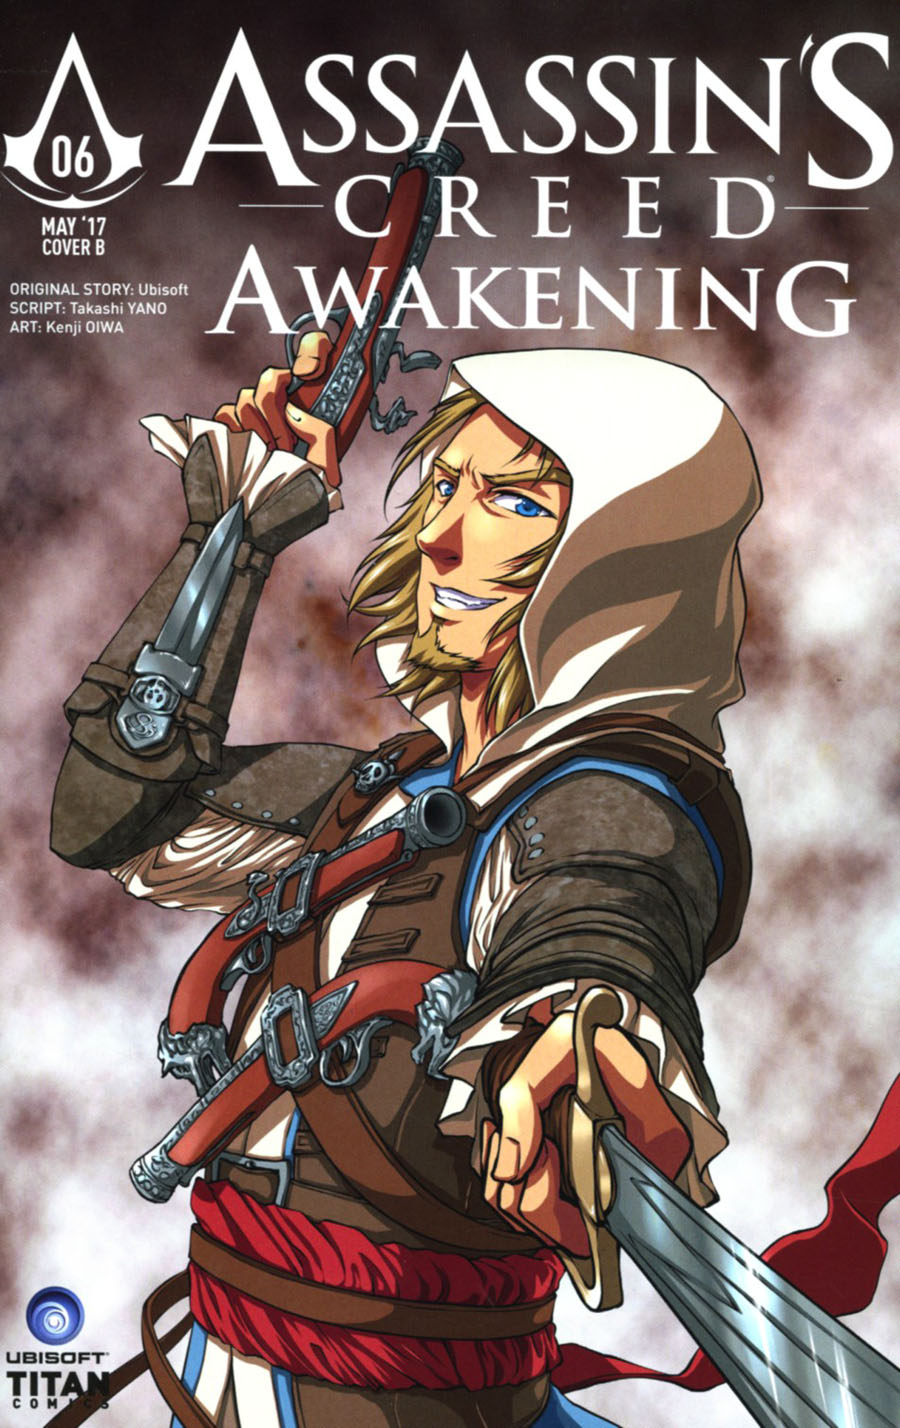 Assassins Creed Awakening #6 Cover B Variant Sonia Leong Cover